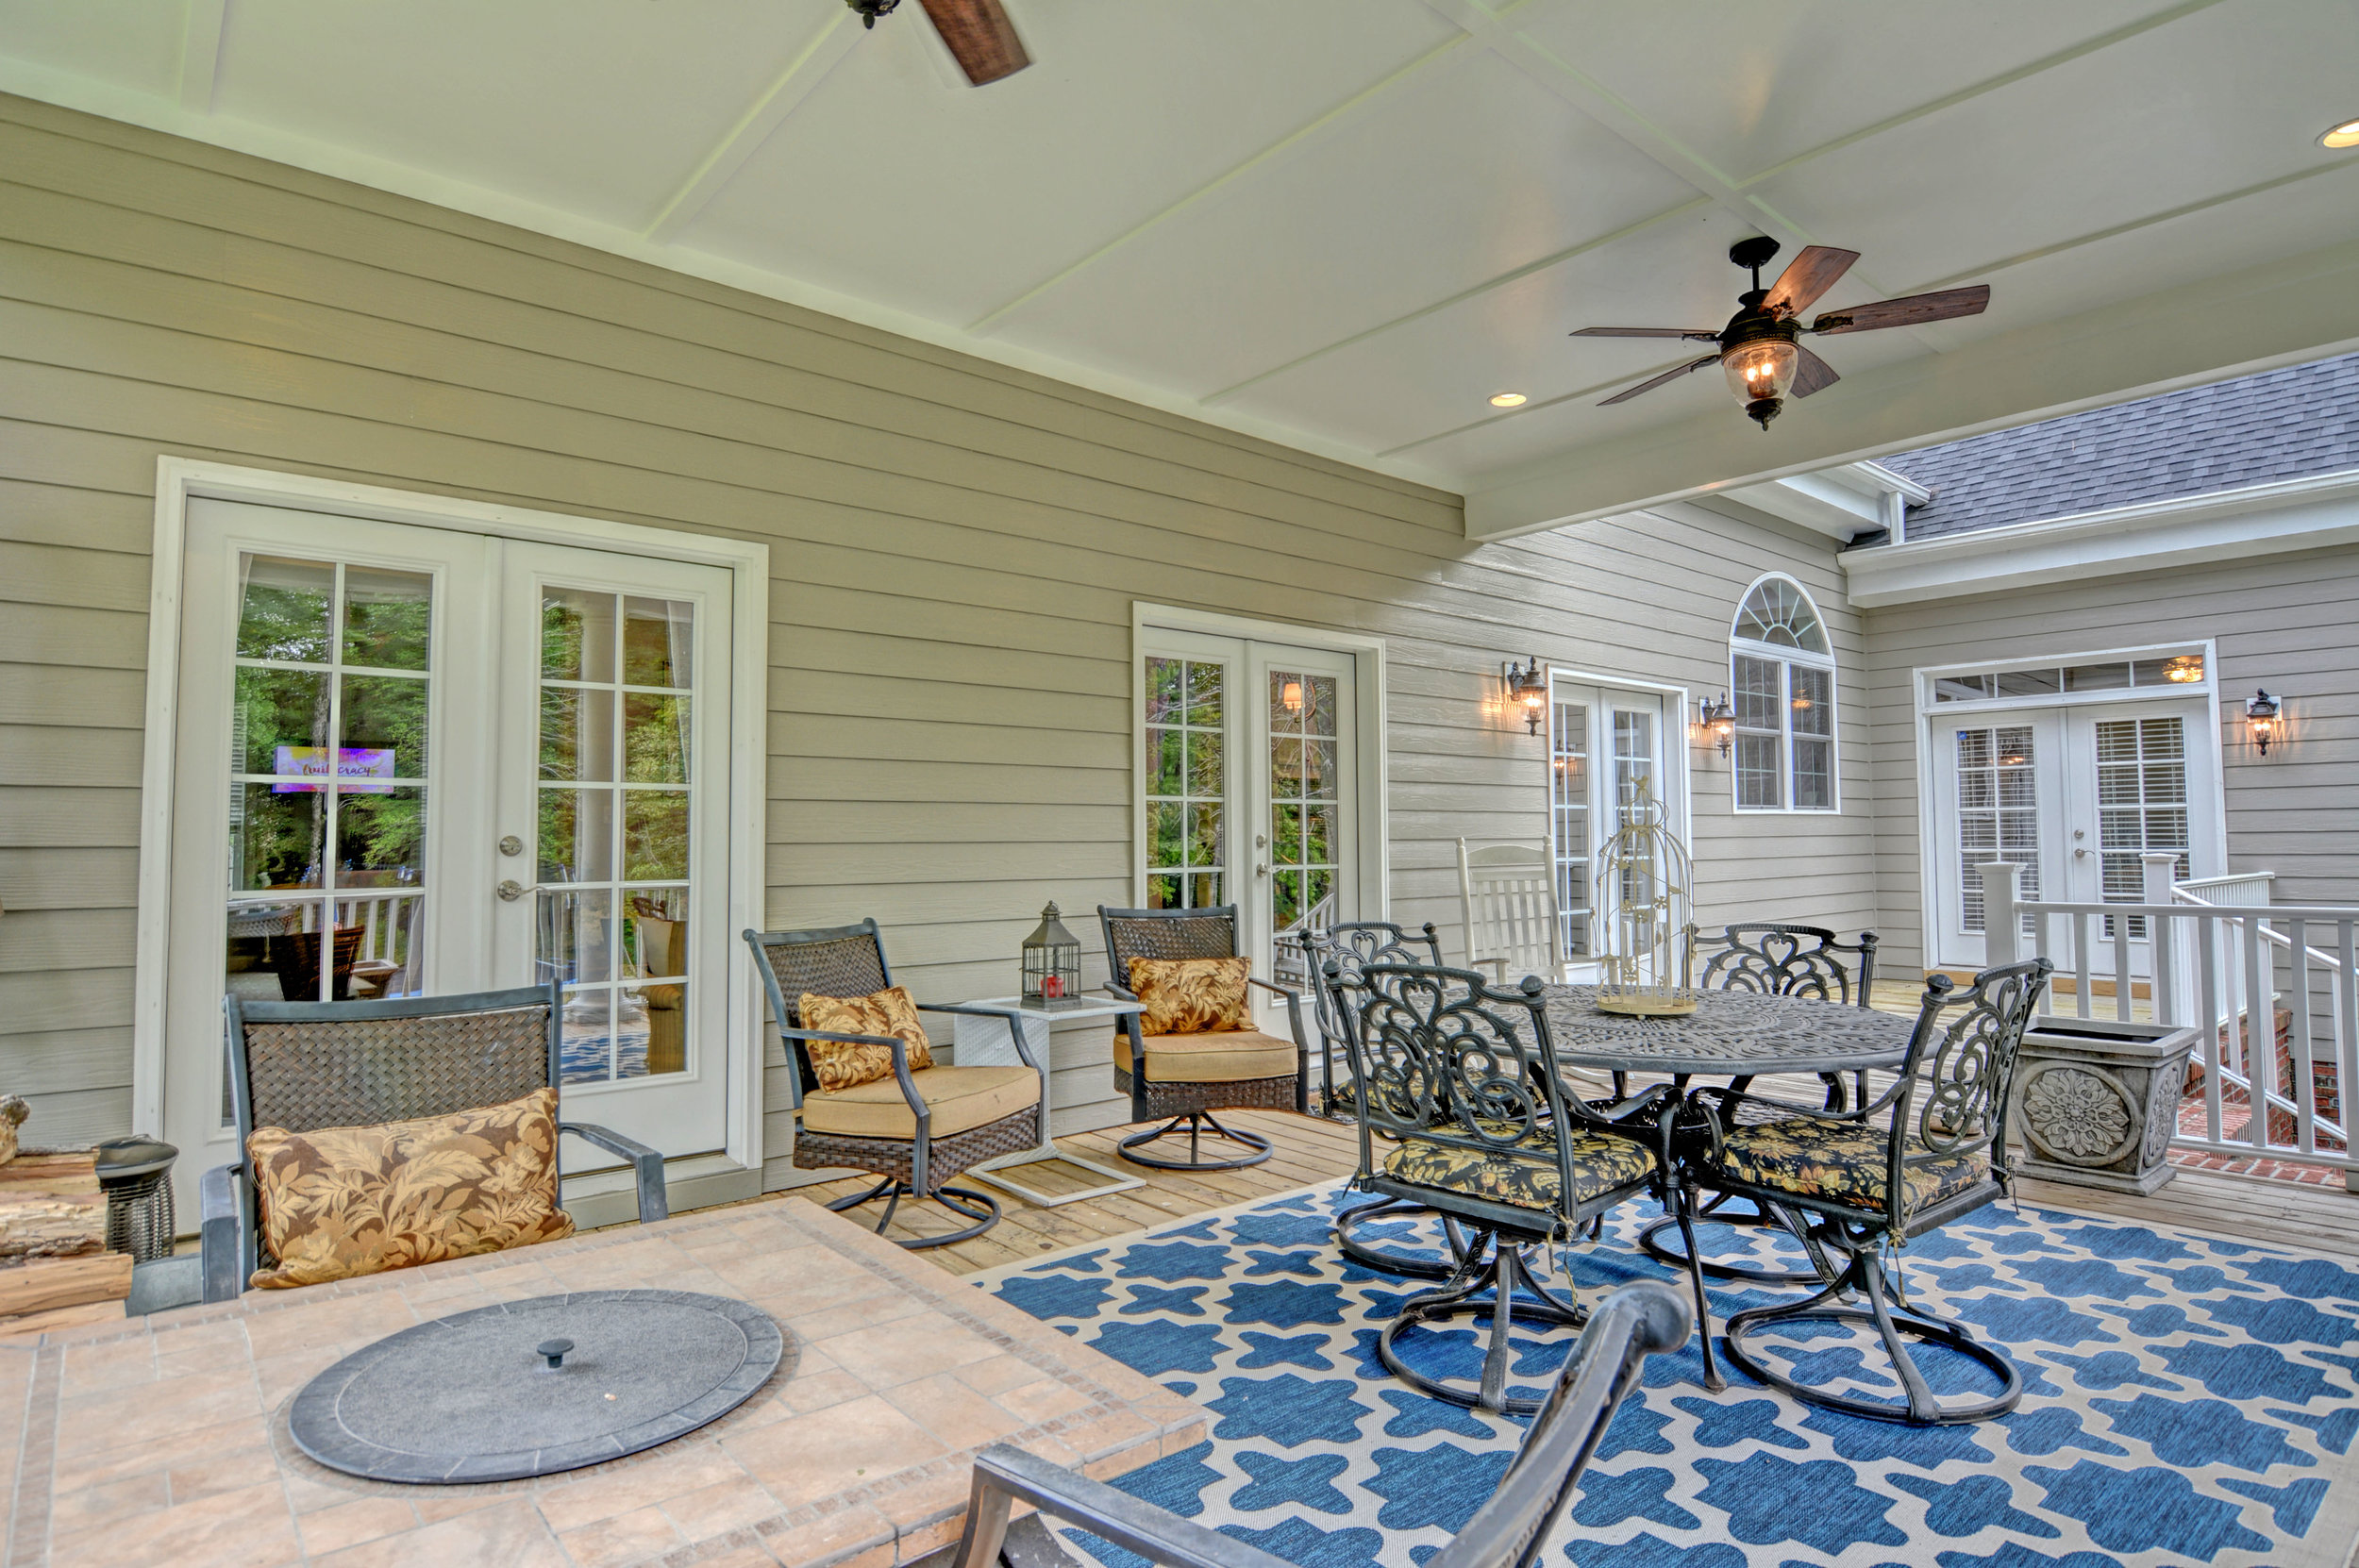 326 Creedmoor Rd Jacksonville-print-047-46-DSC 2002 3 4-4200x2793-300dpi.jpg